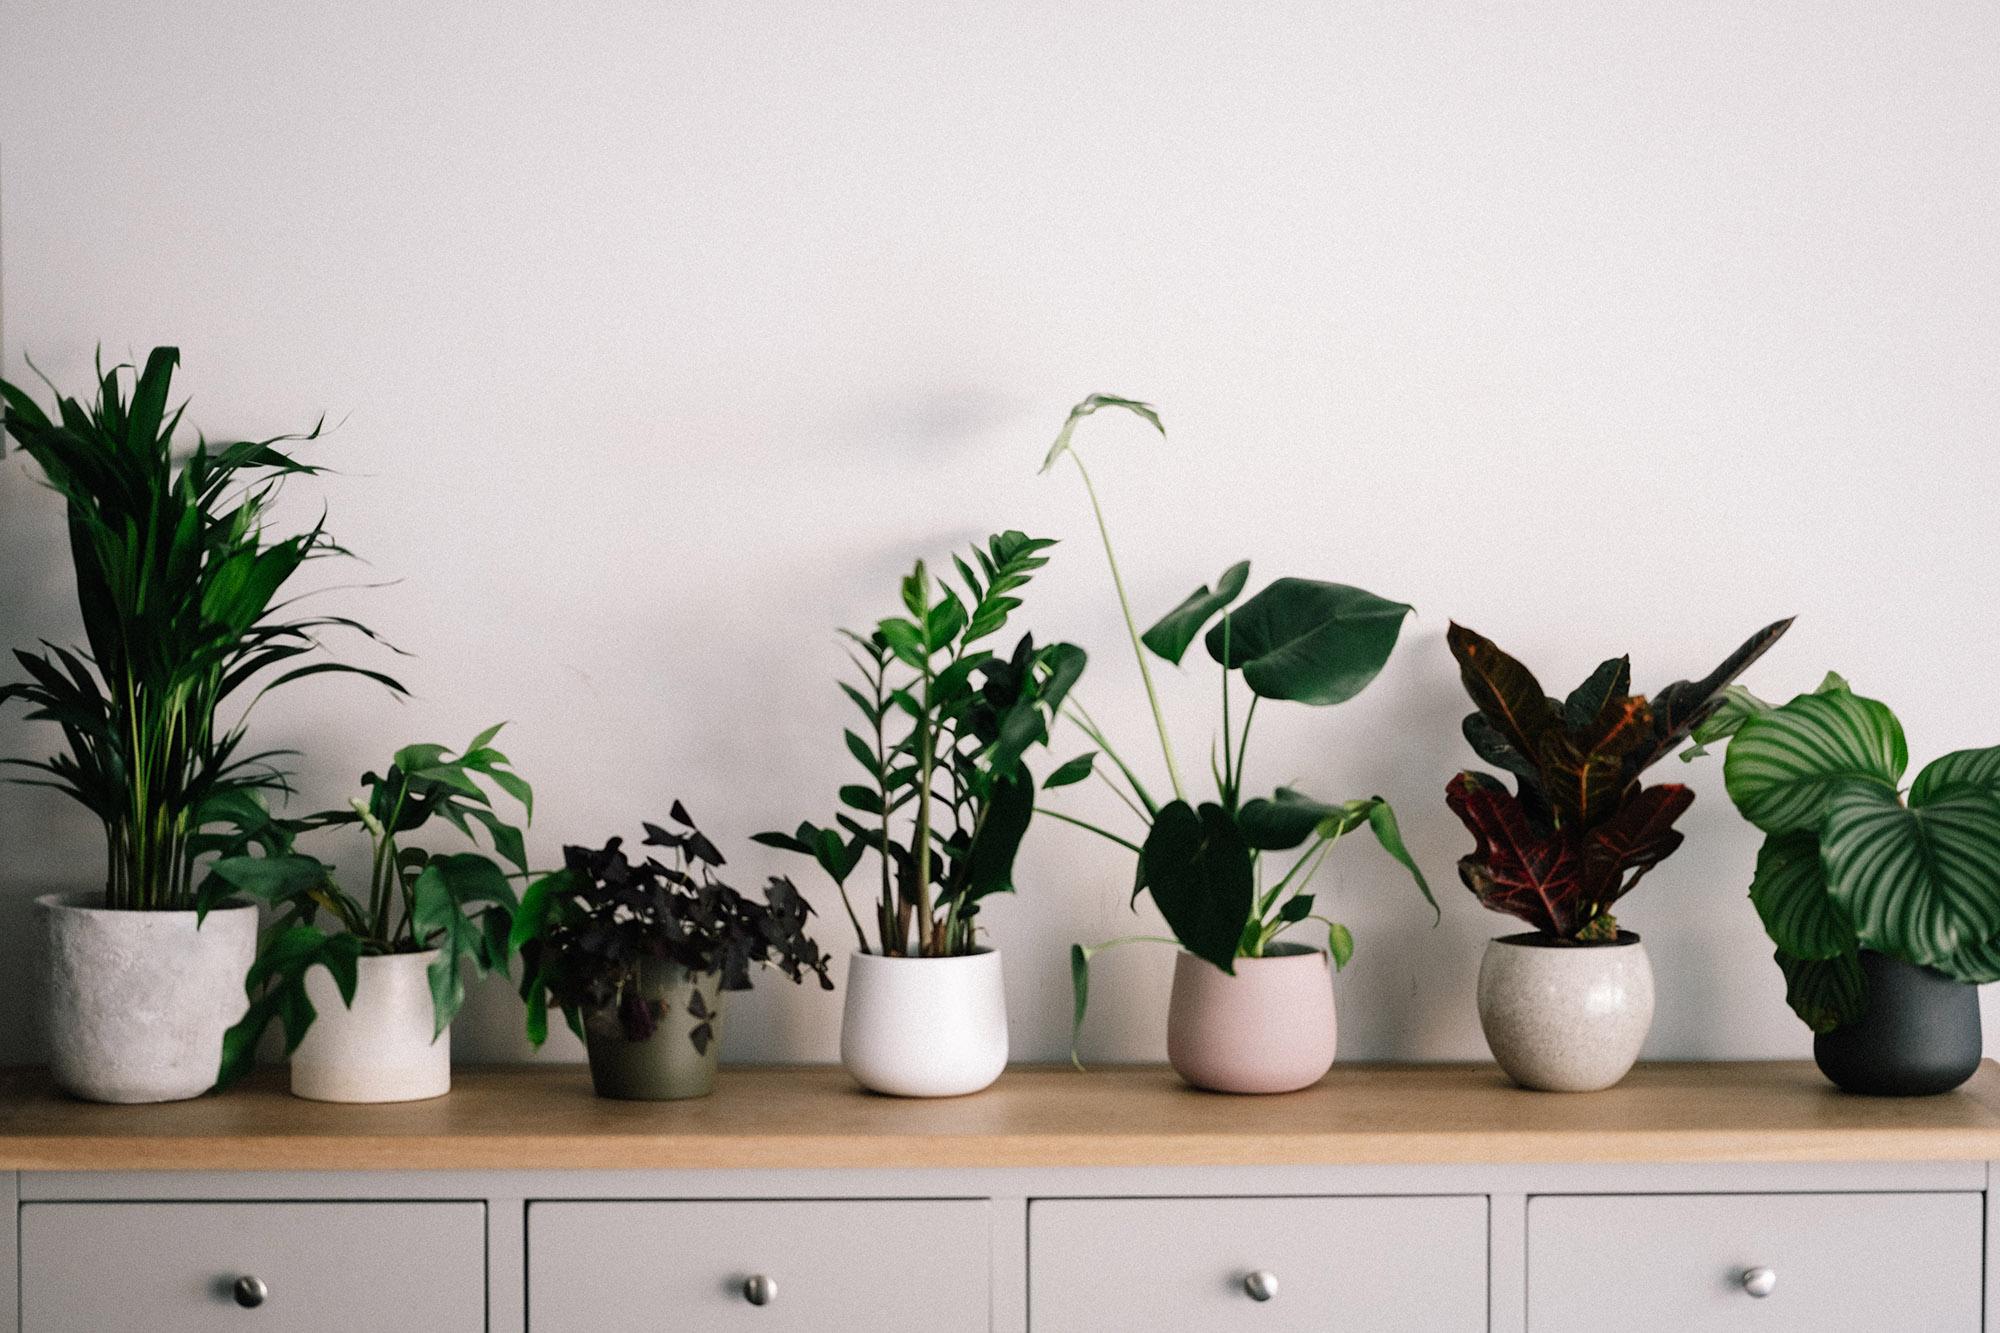 Small urban garden plants